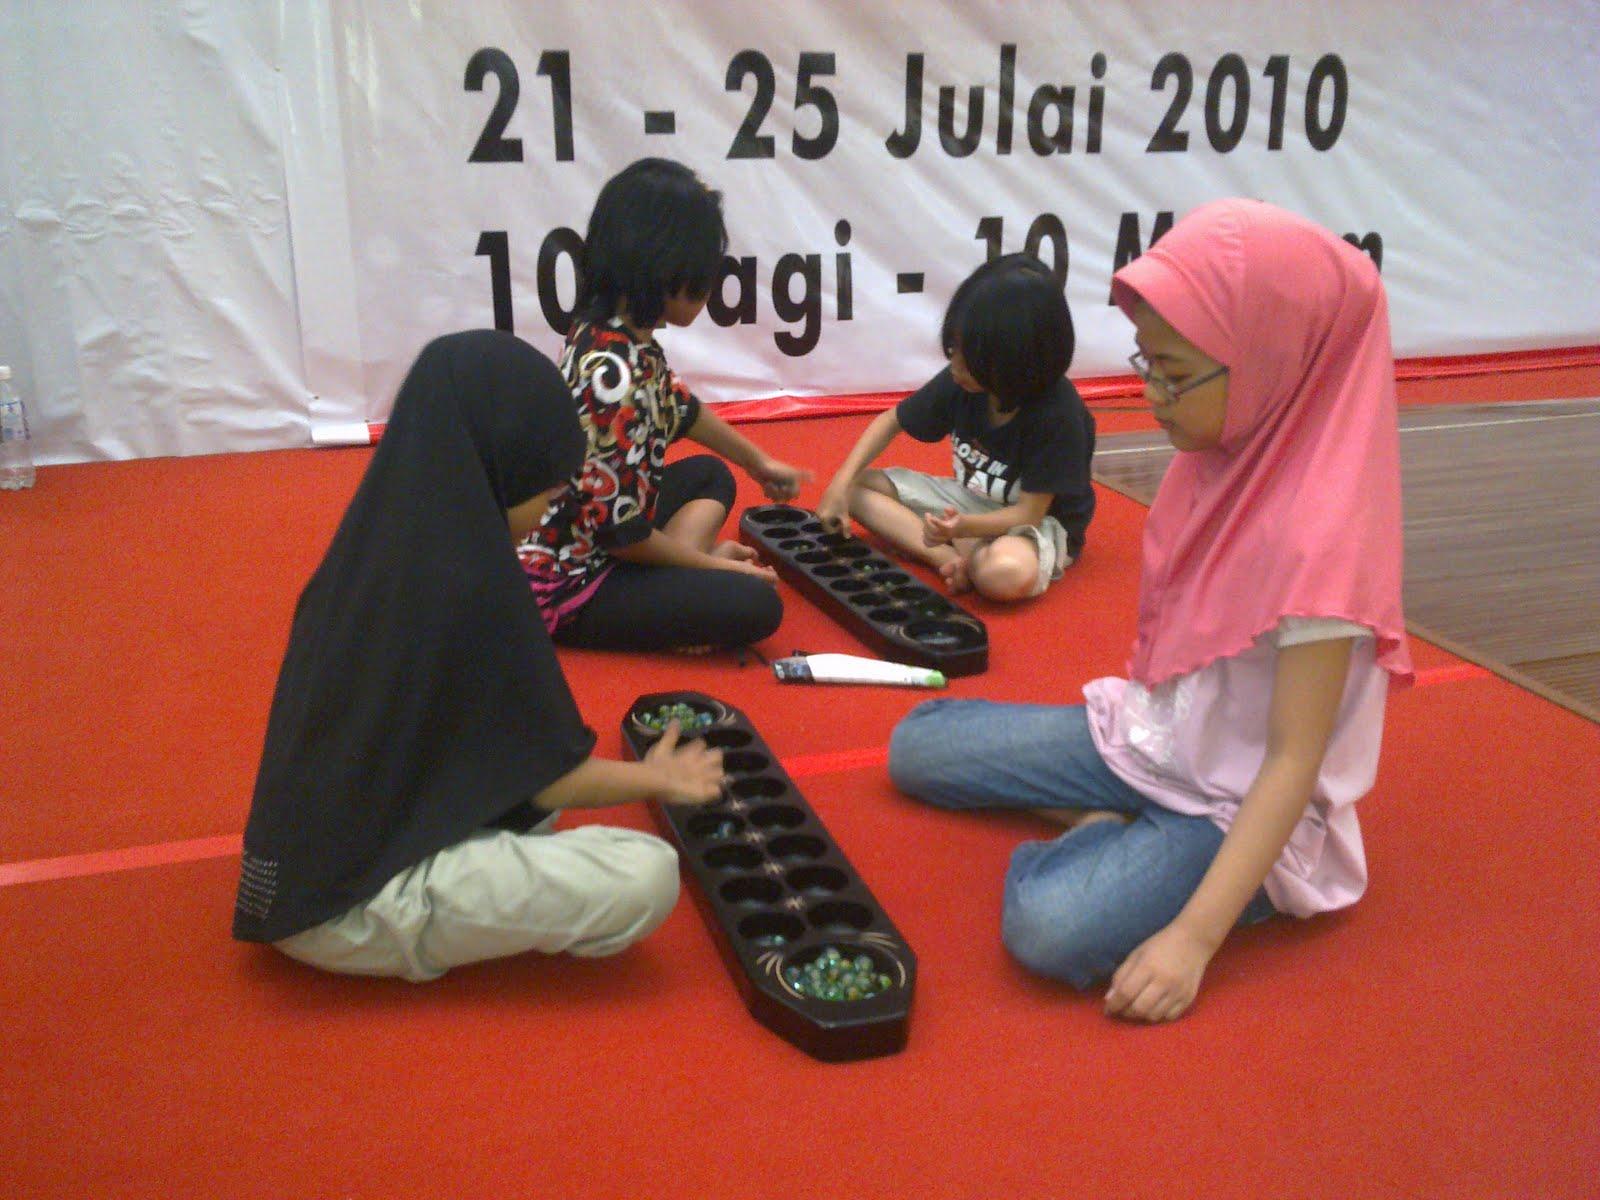 Gambar+permainan+tradisional+di+malaysia